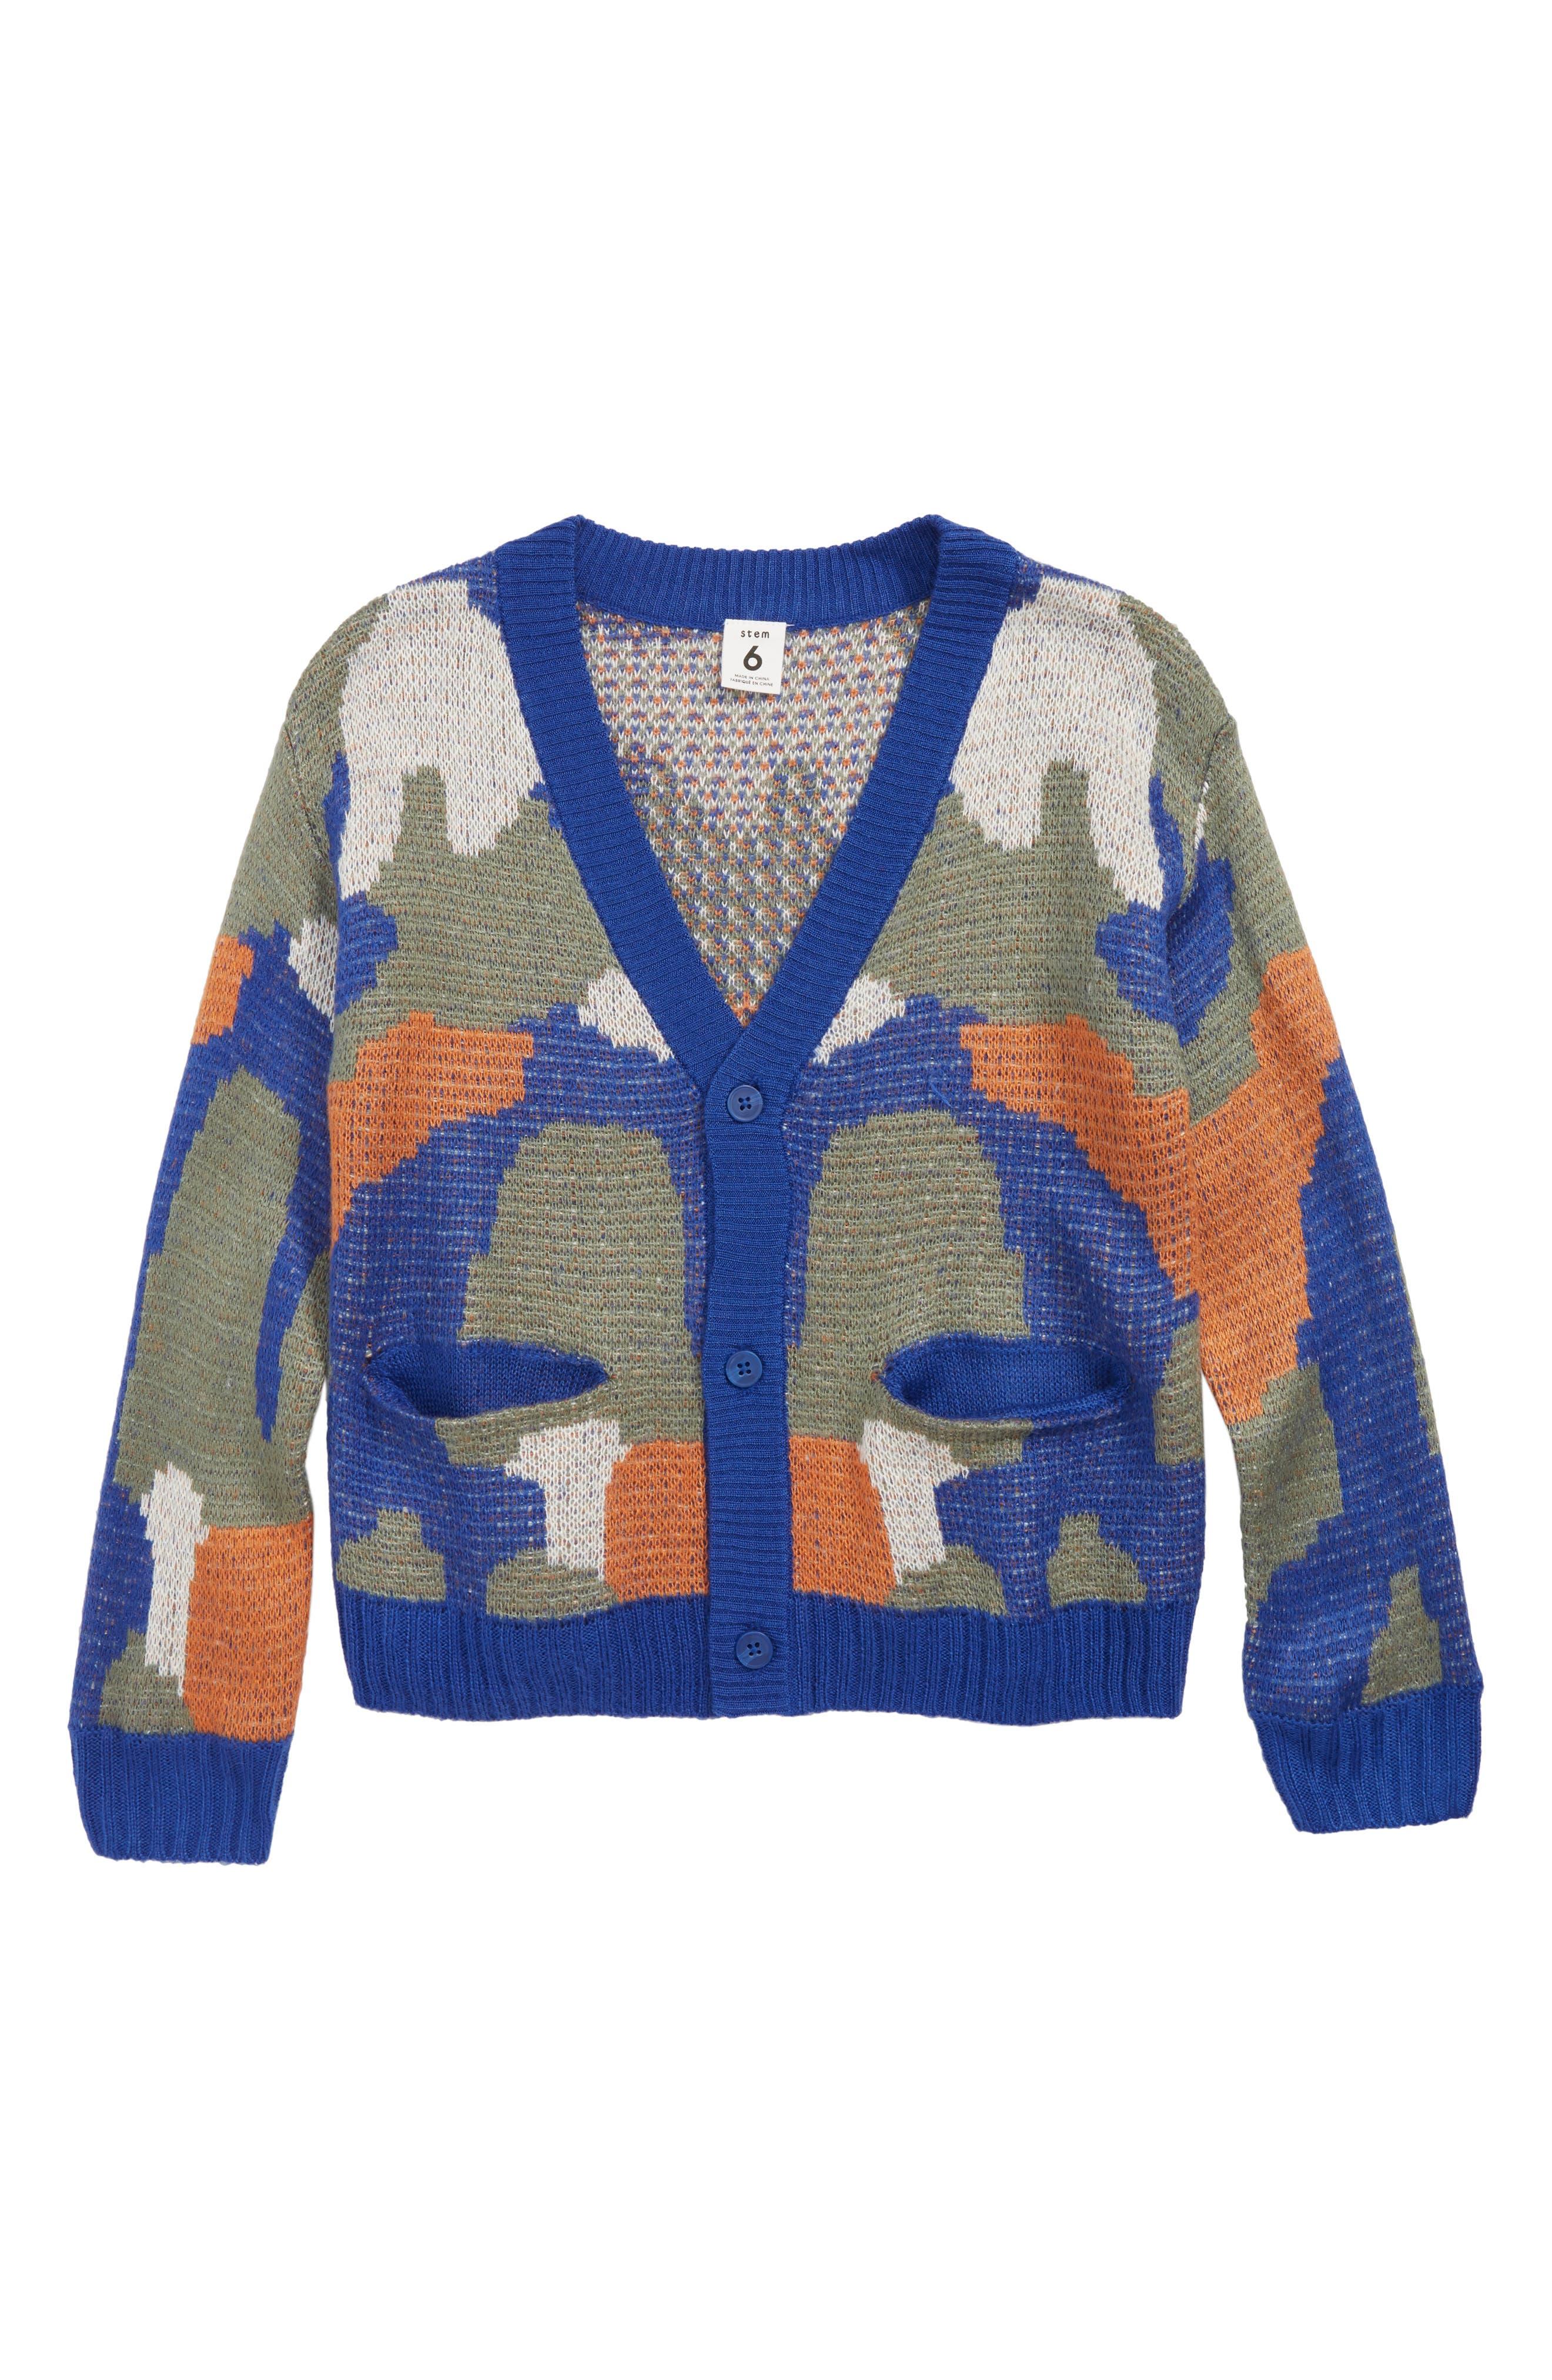 Abstract Cardigan,                         Main,                         color, BLUE MAZARINE CAMO